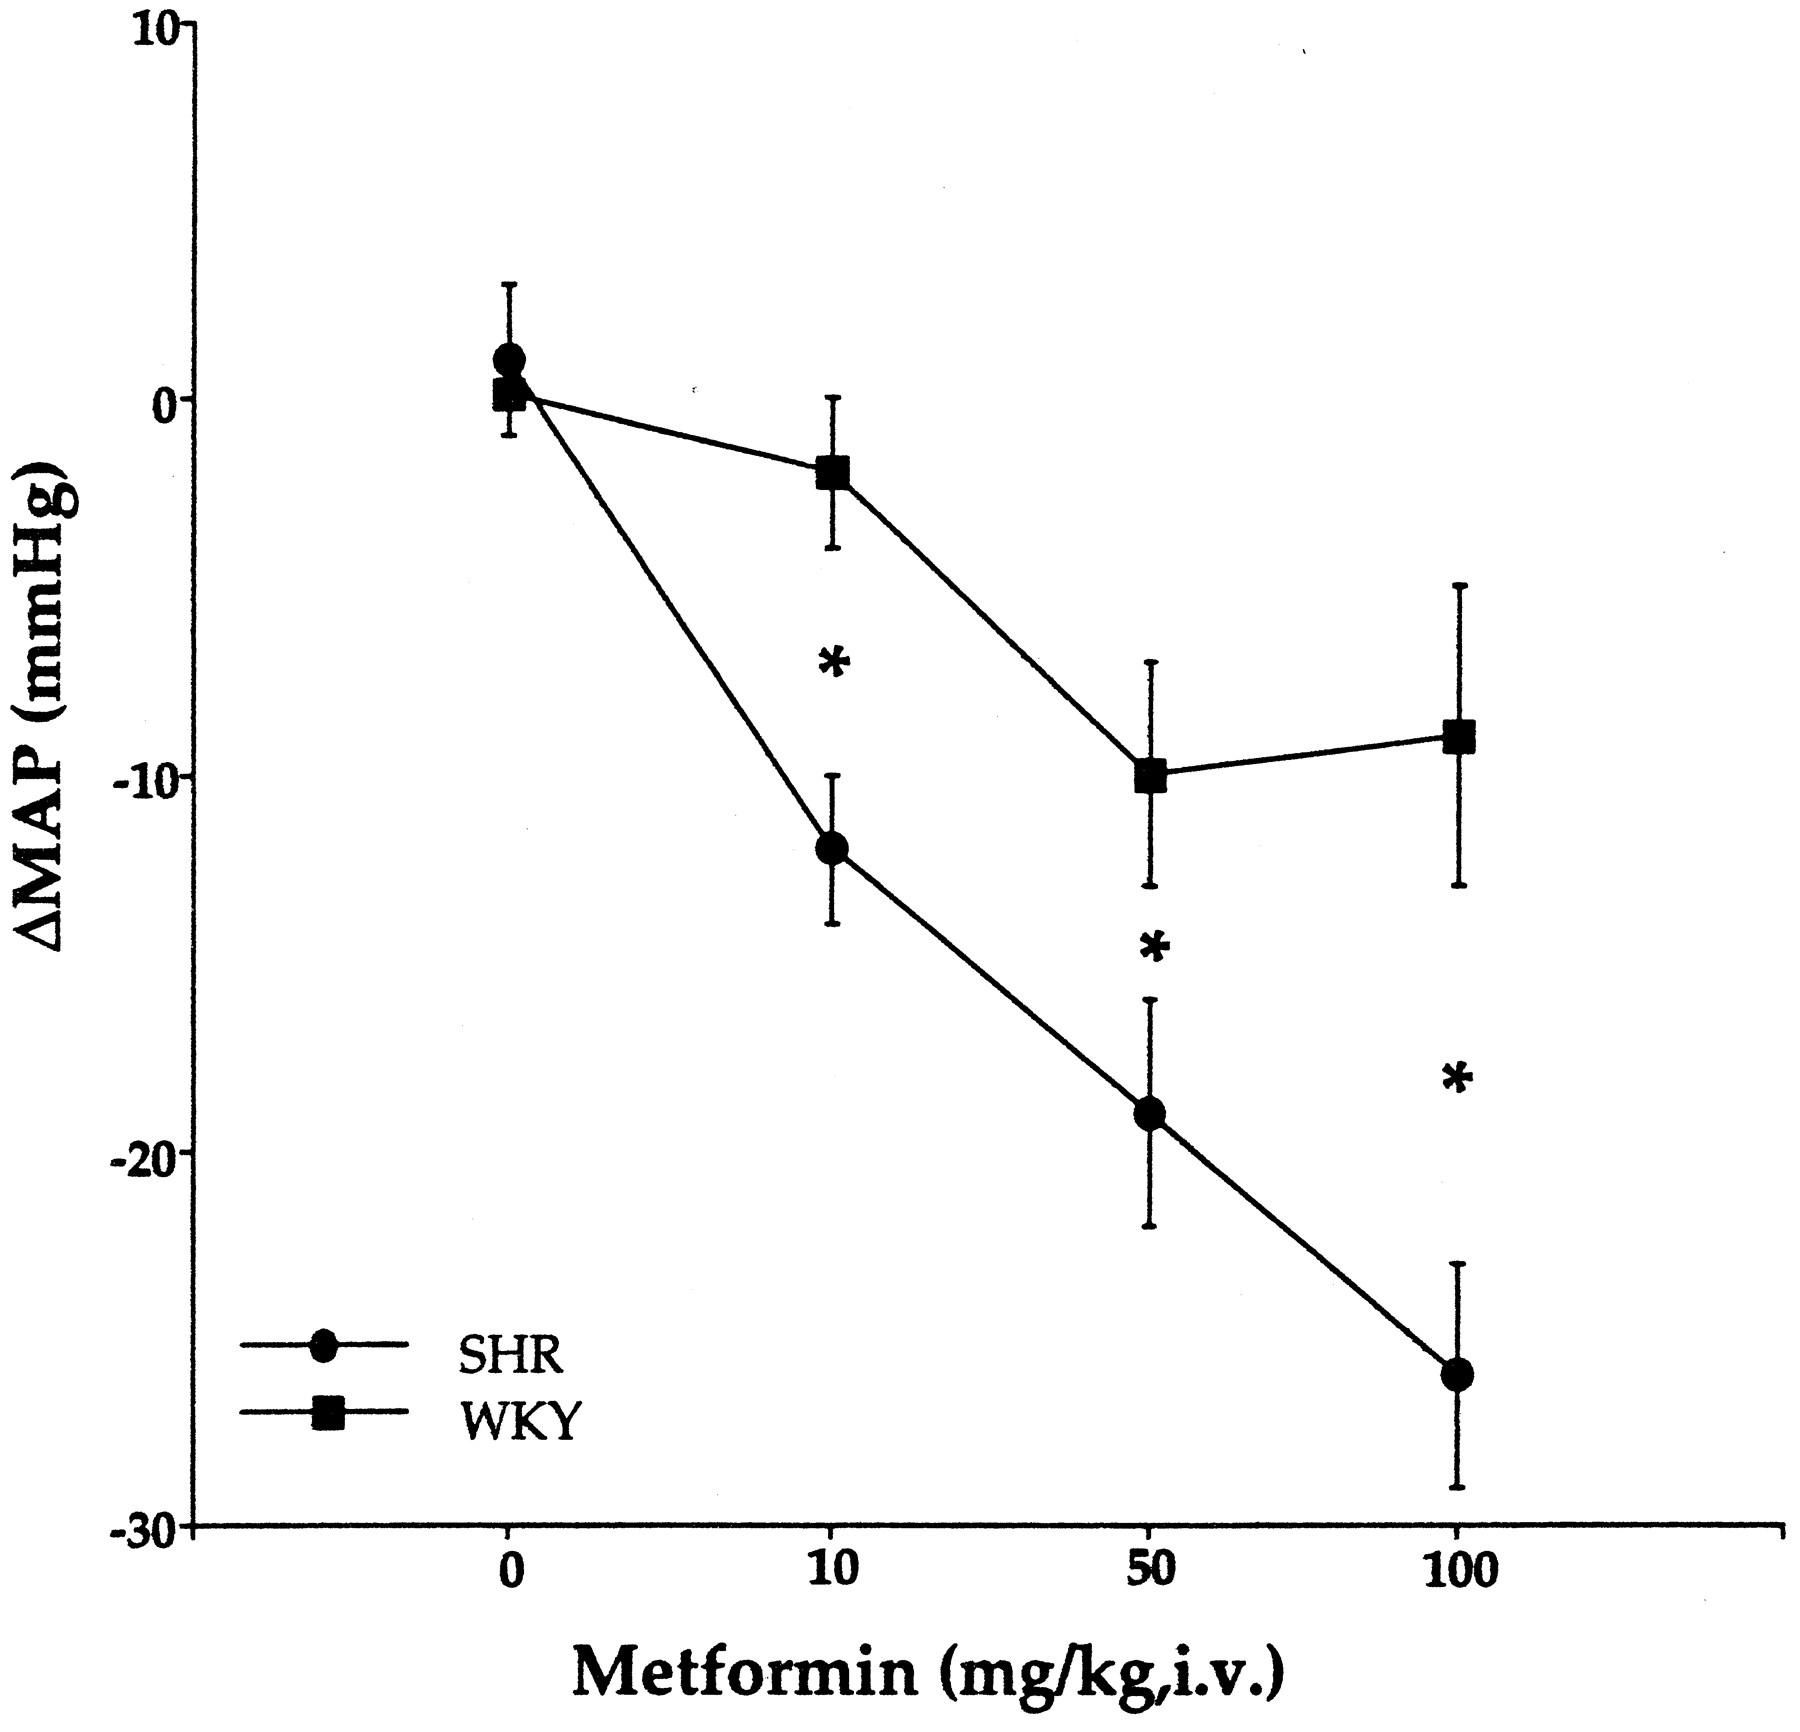 Effects of Adrenergic, Cholinergic and Ganglionic Blockade